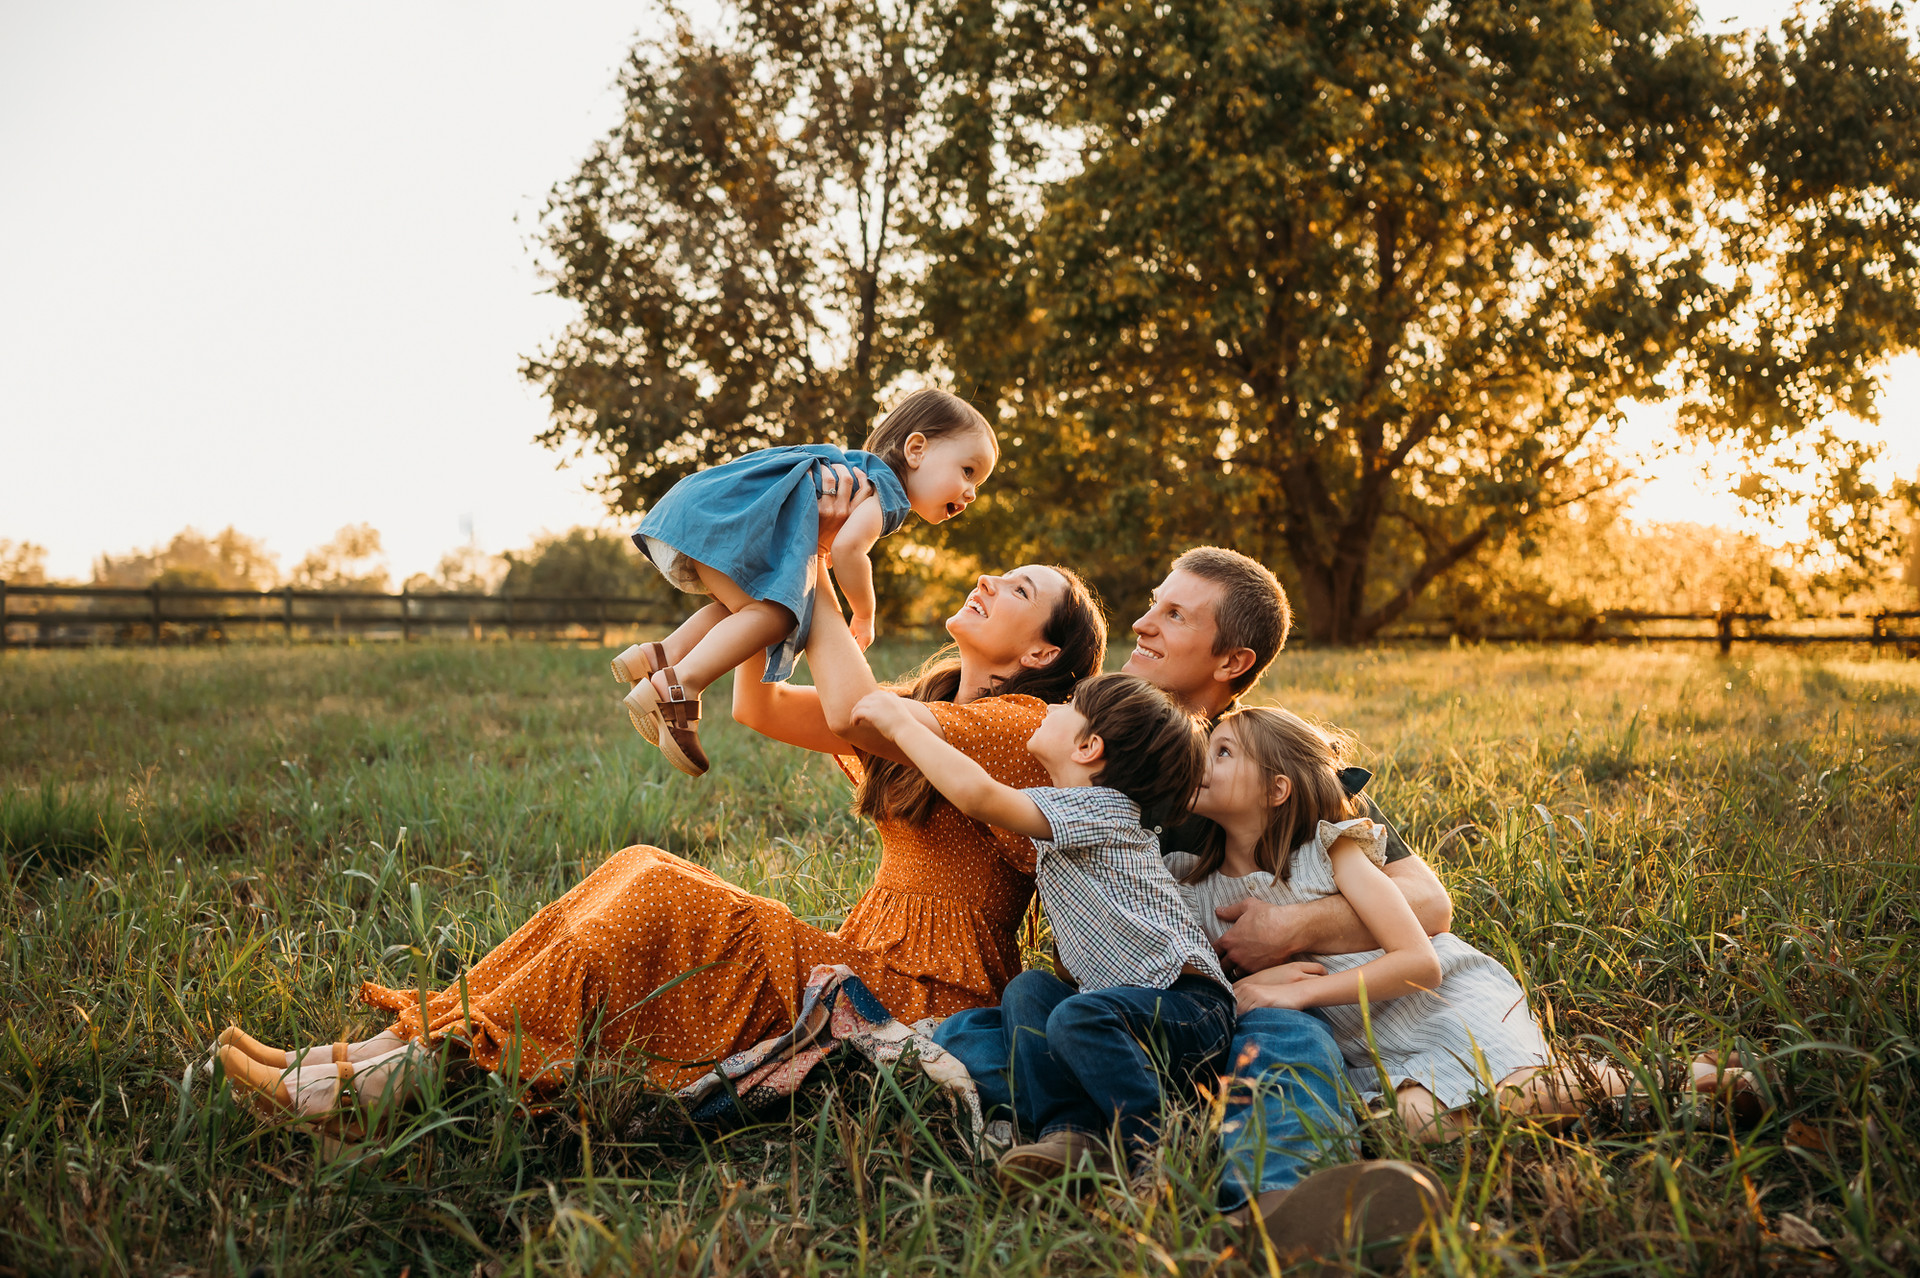 Katy_family_photographer-1.jpg